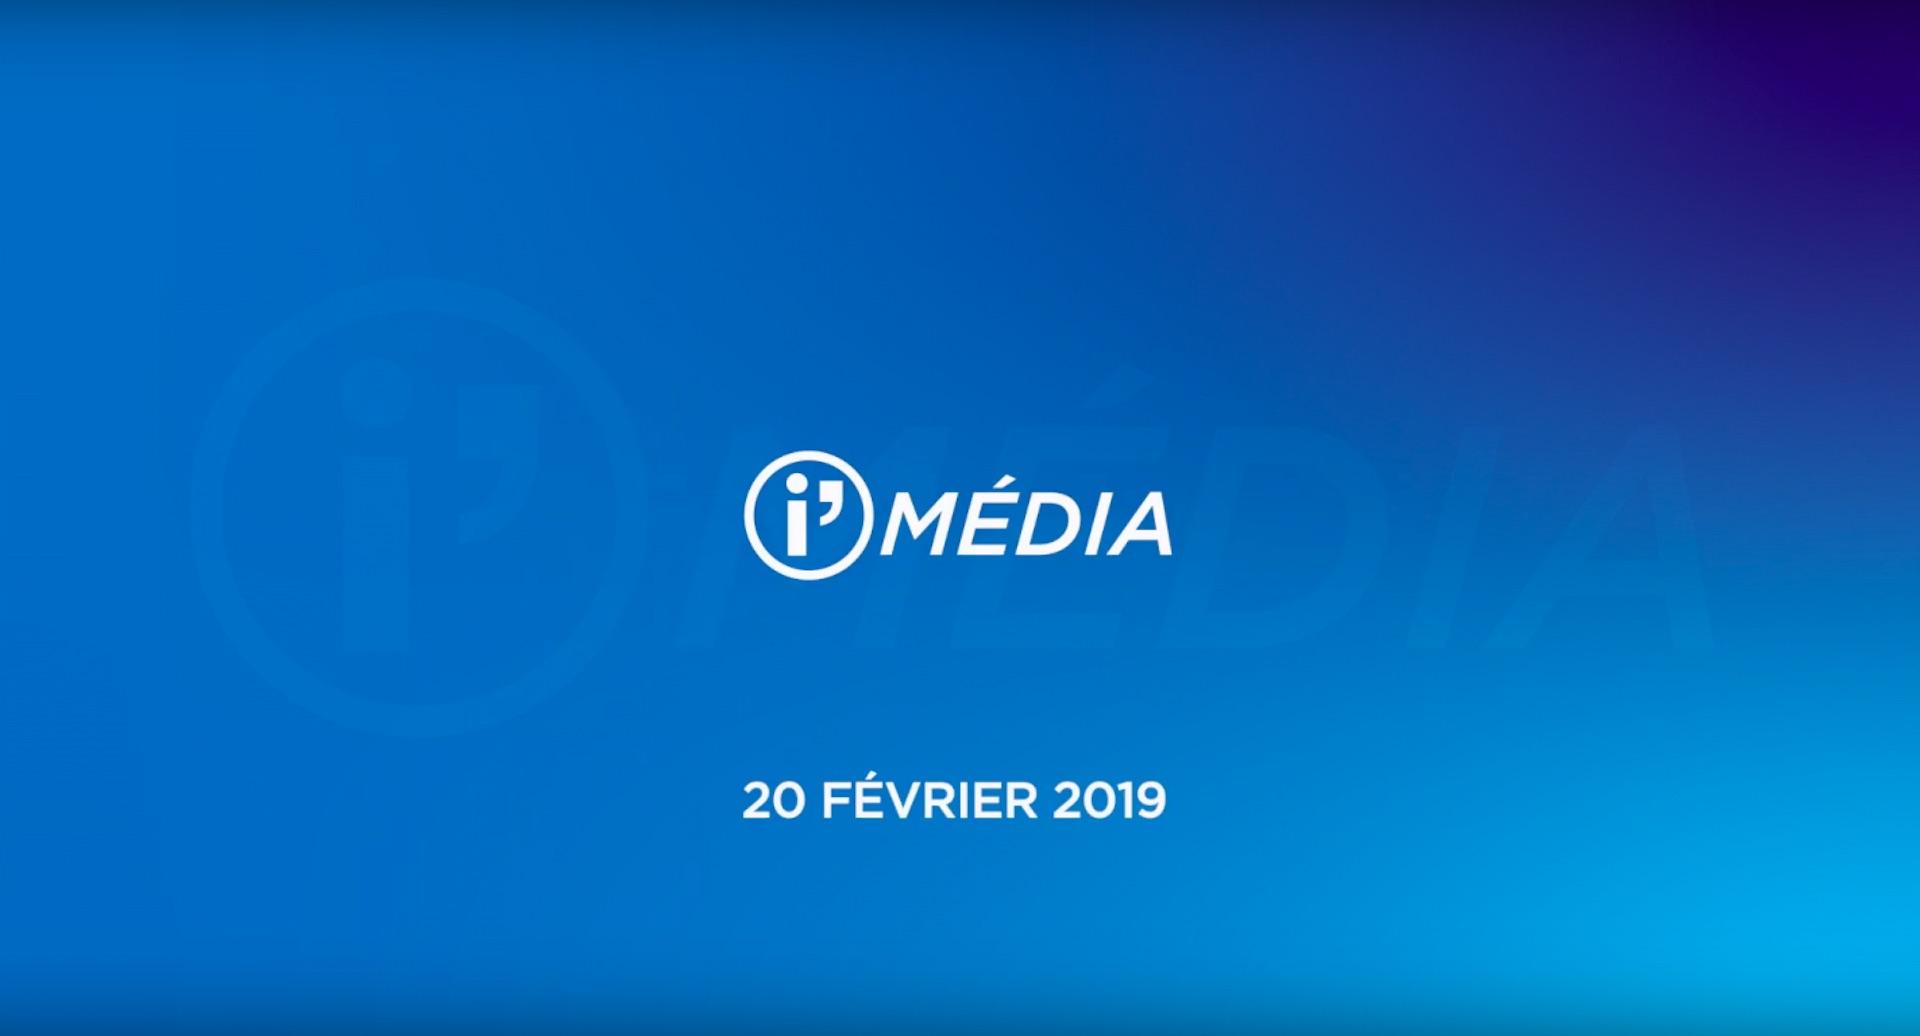 I' Média 20.02.19